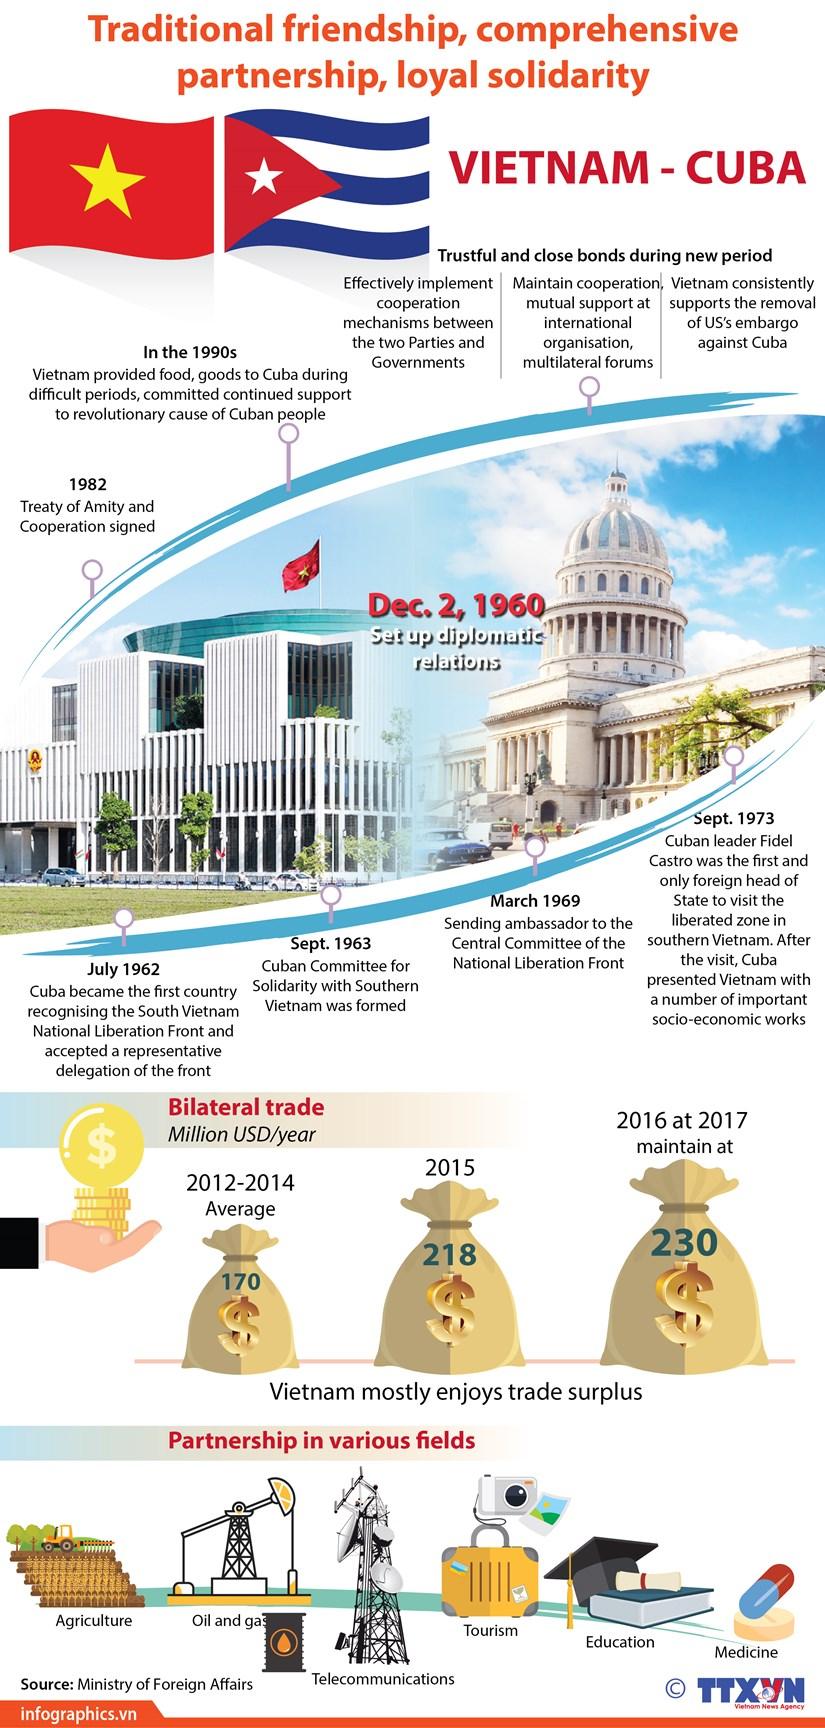 Vietnam, Cuba enjoy loyal solidarity through historical periods hinh anh 1